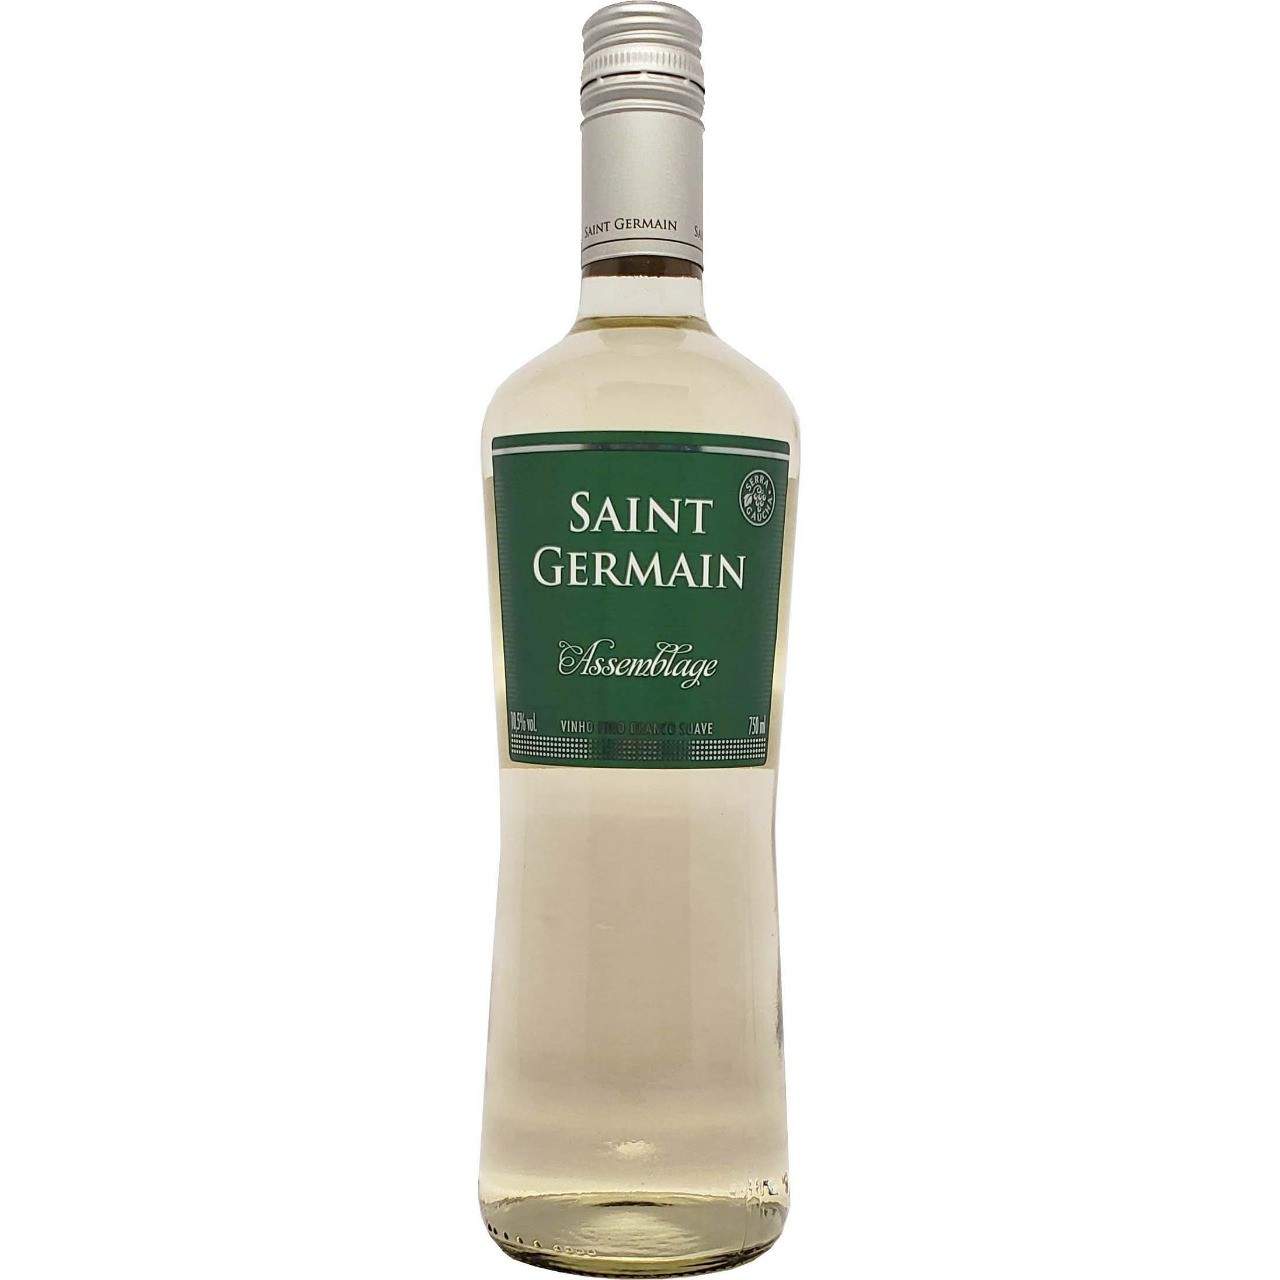 Vinho Branco Assemblage  Saint Germain - 750ml -